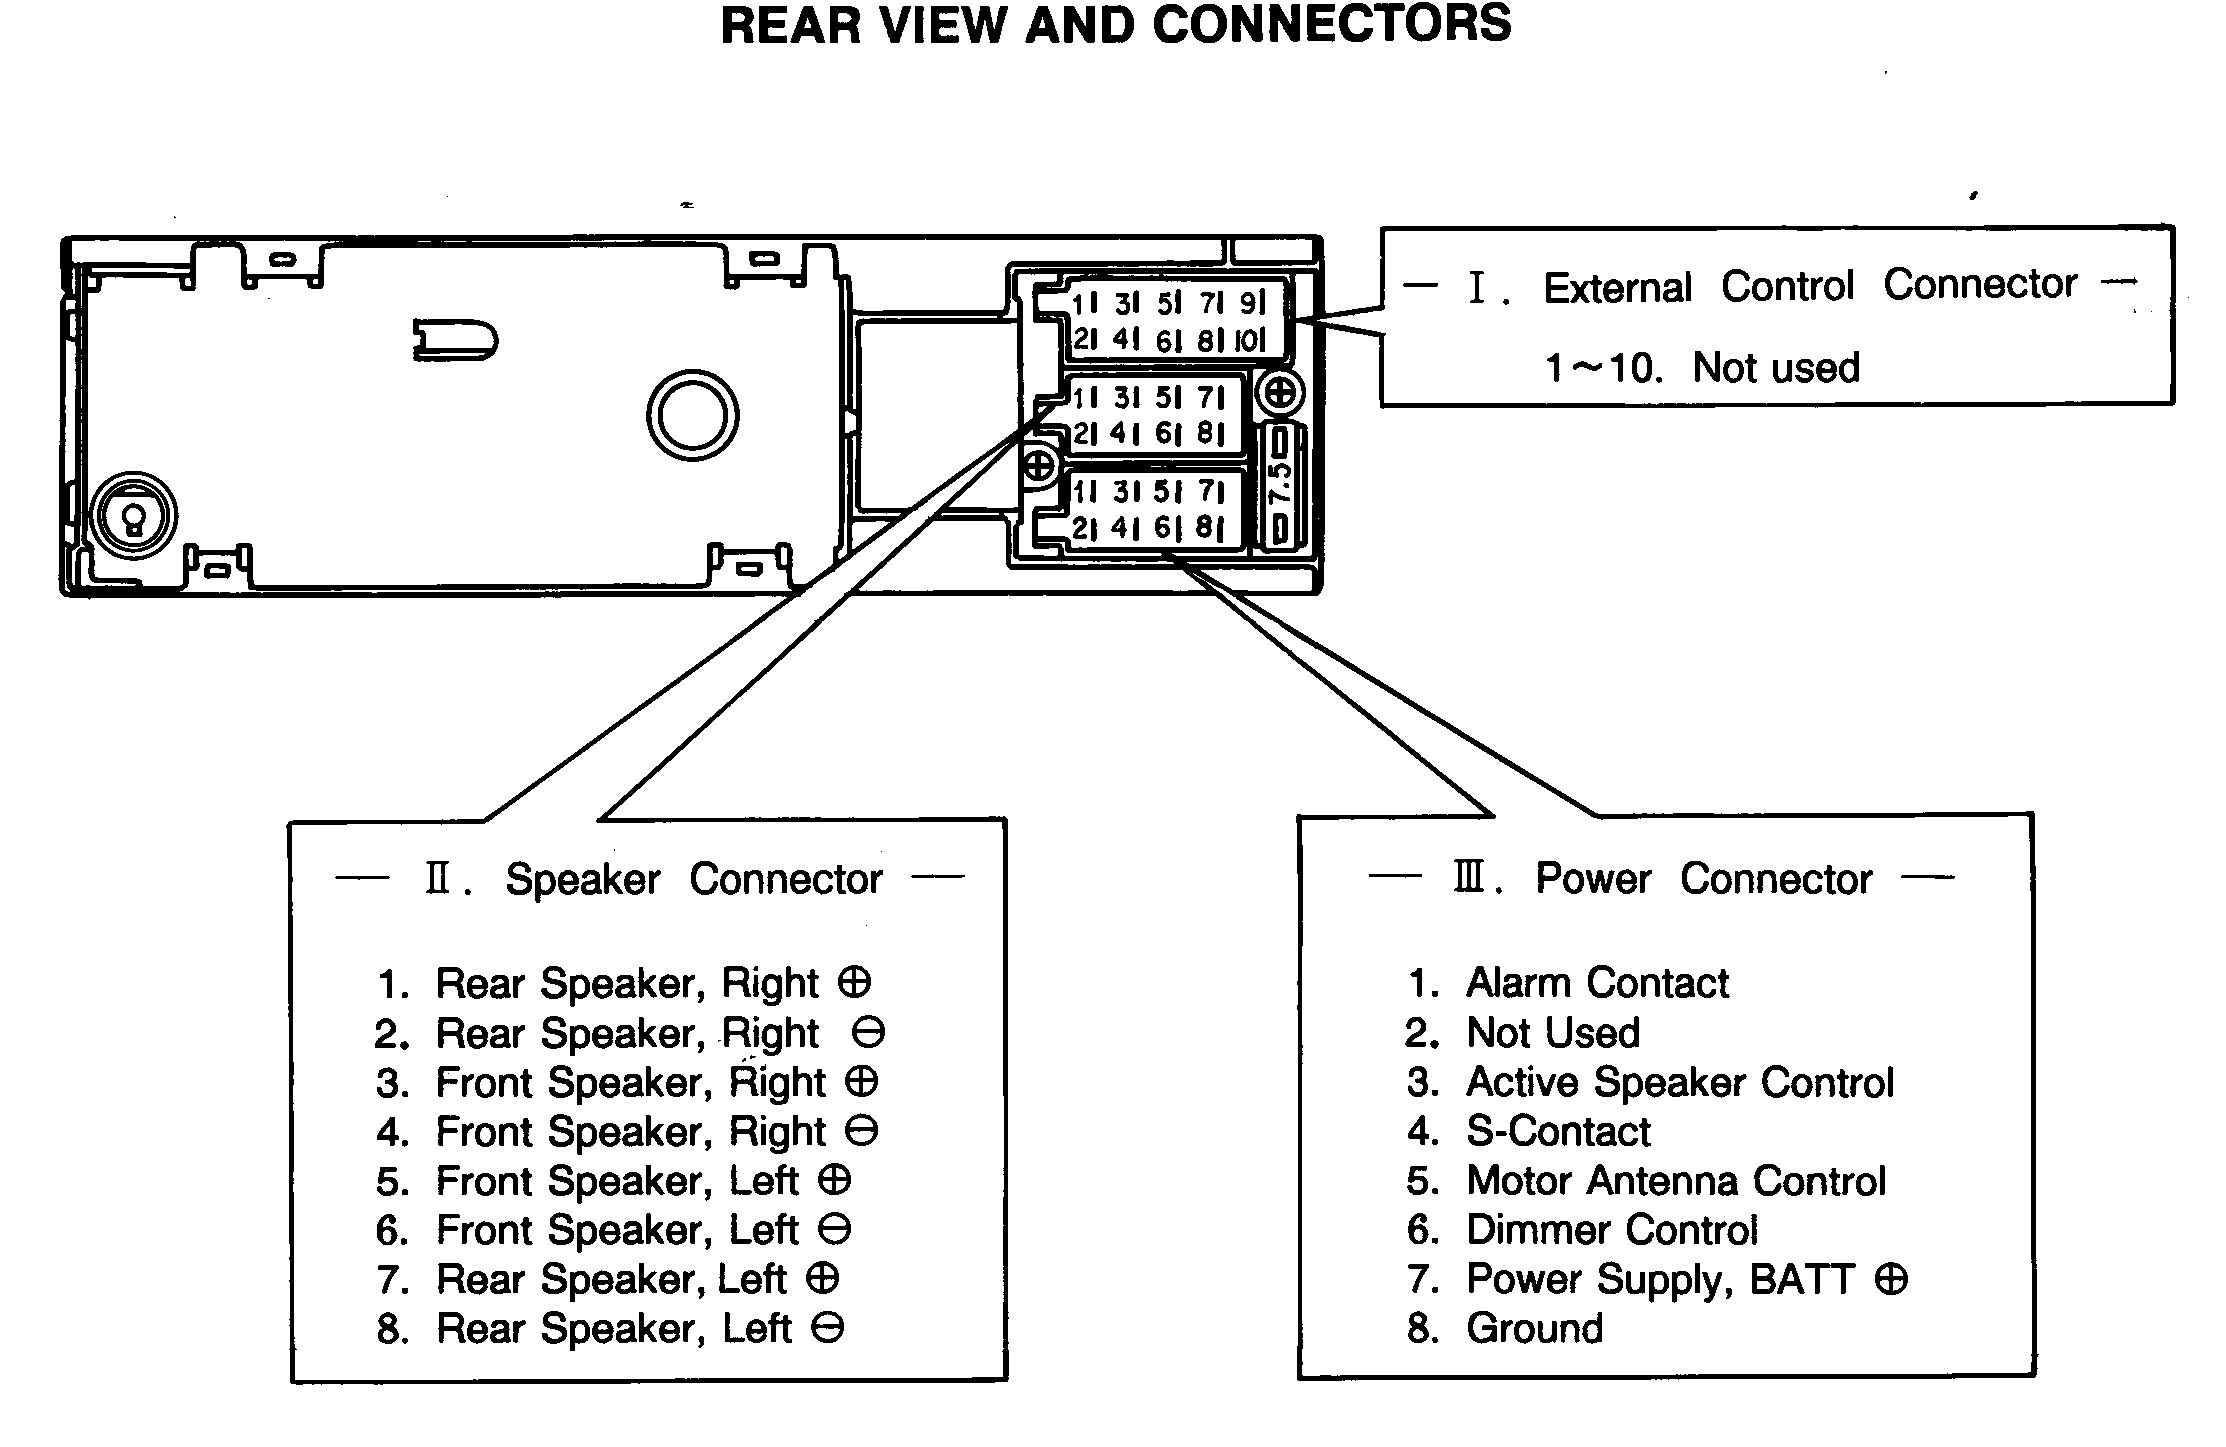 Honda Civic 1997 Engine Diagram Cr V Radio Wiring 2007 Stereo Blurts Of